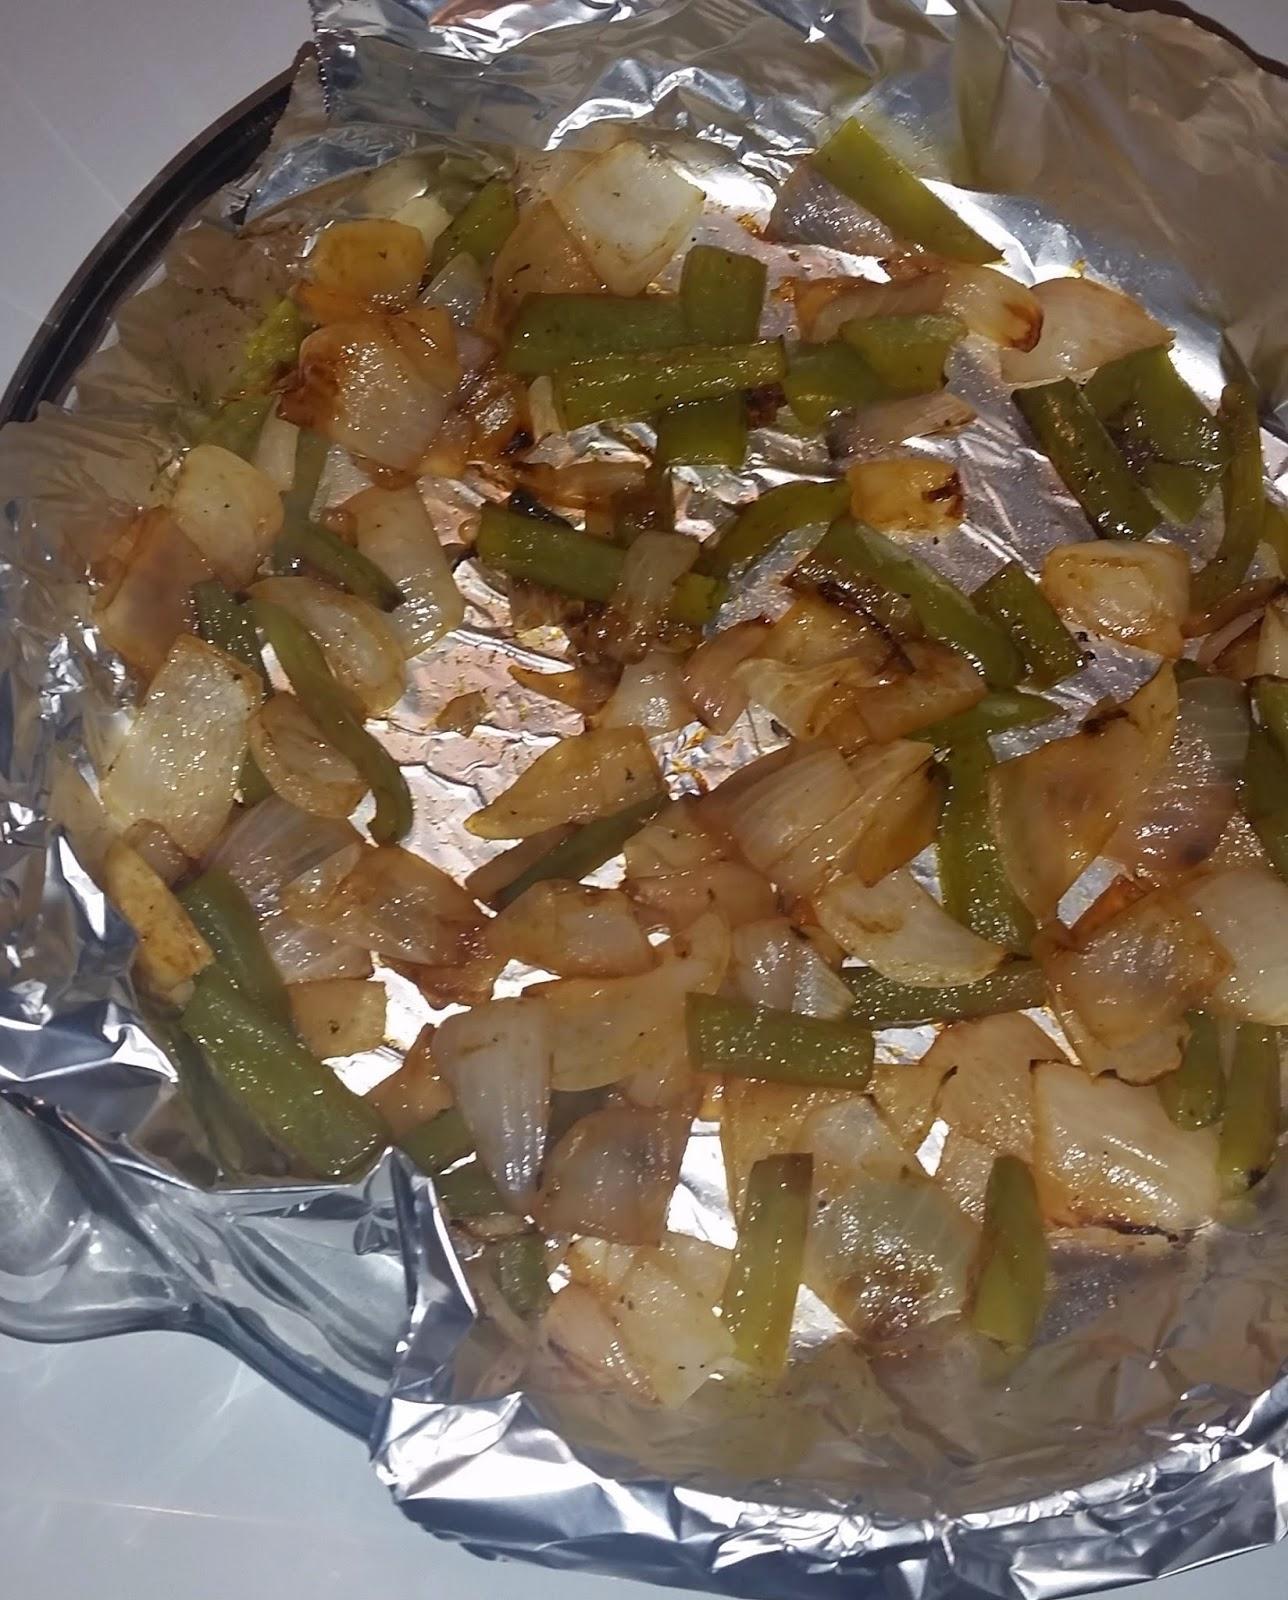 Roasted Vegetables. Easy steps on roasting root vegetables!